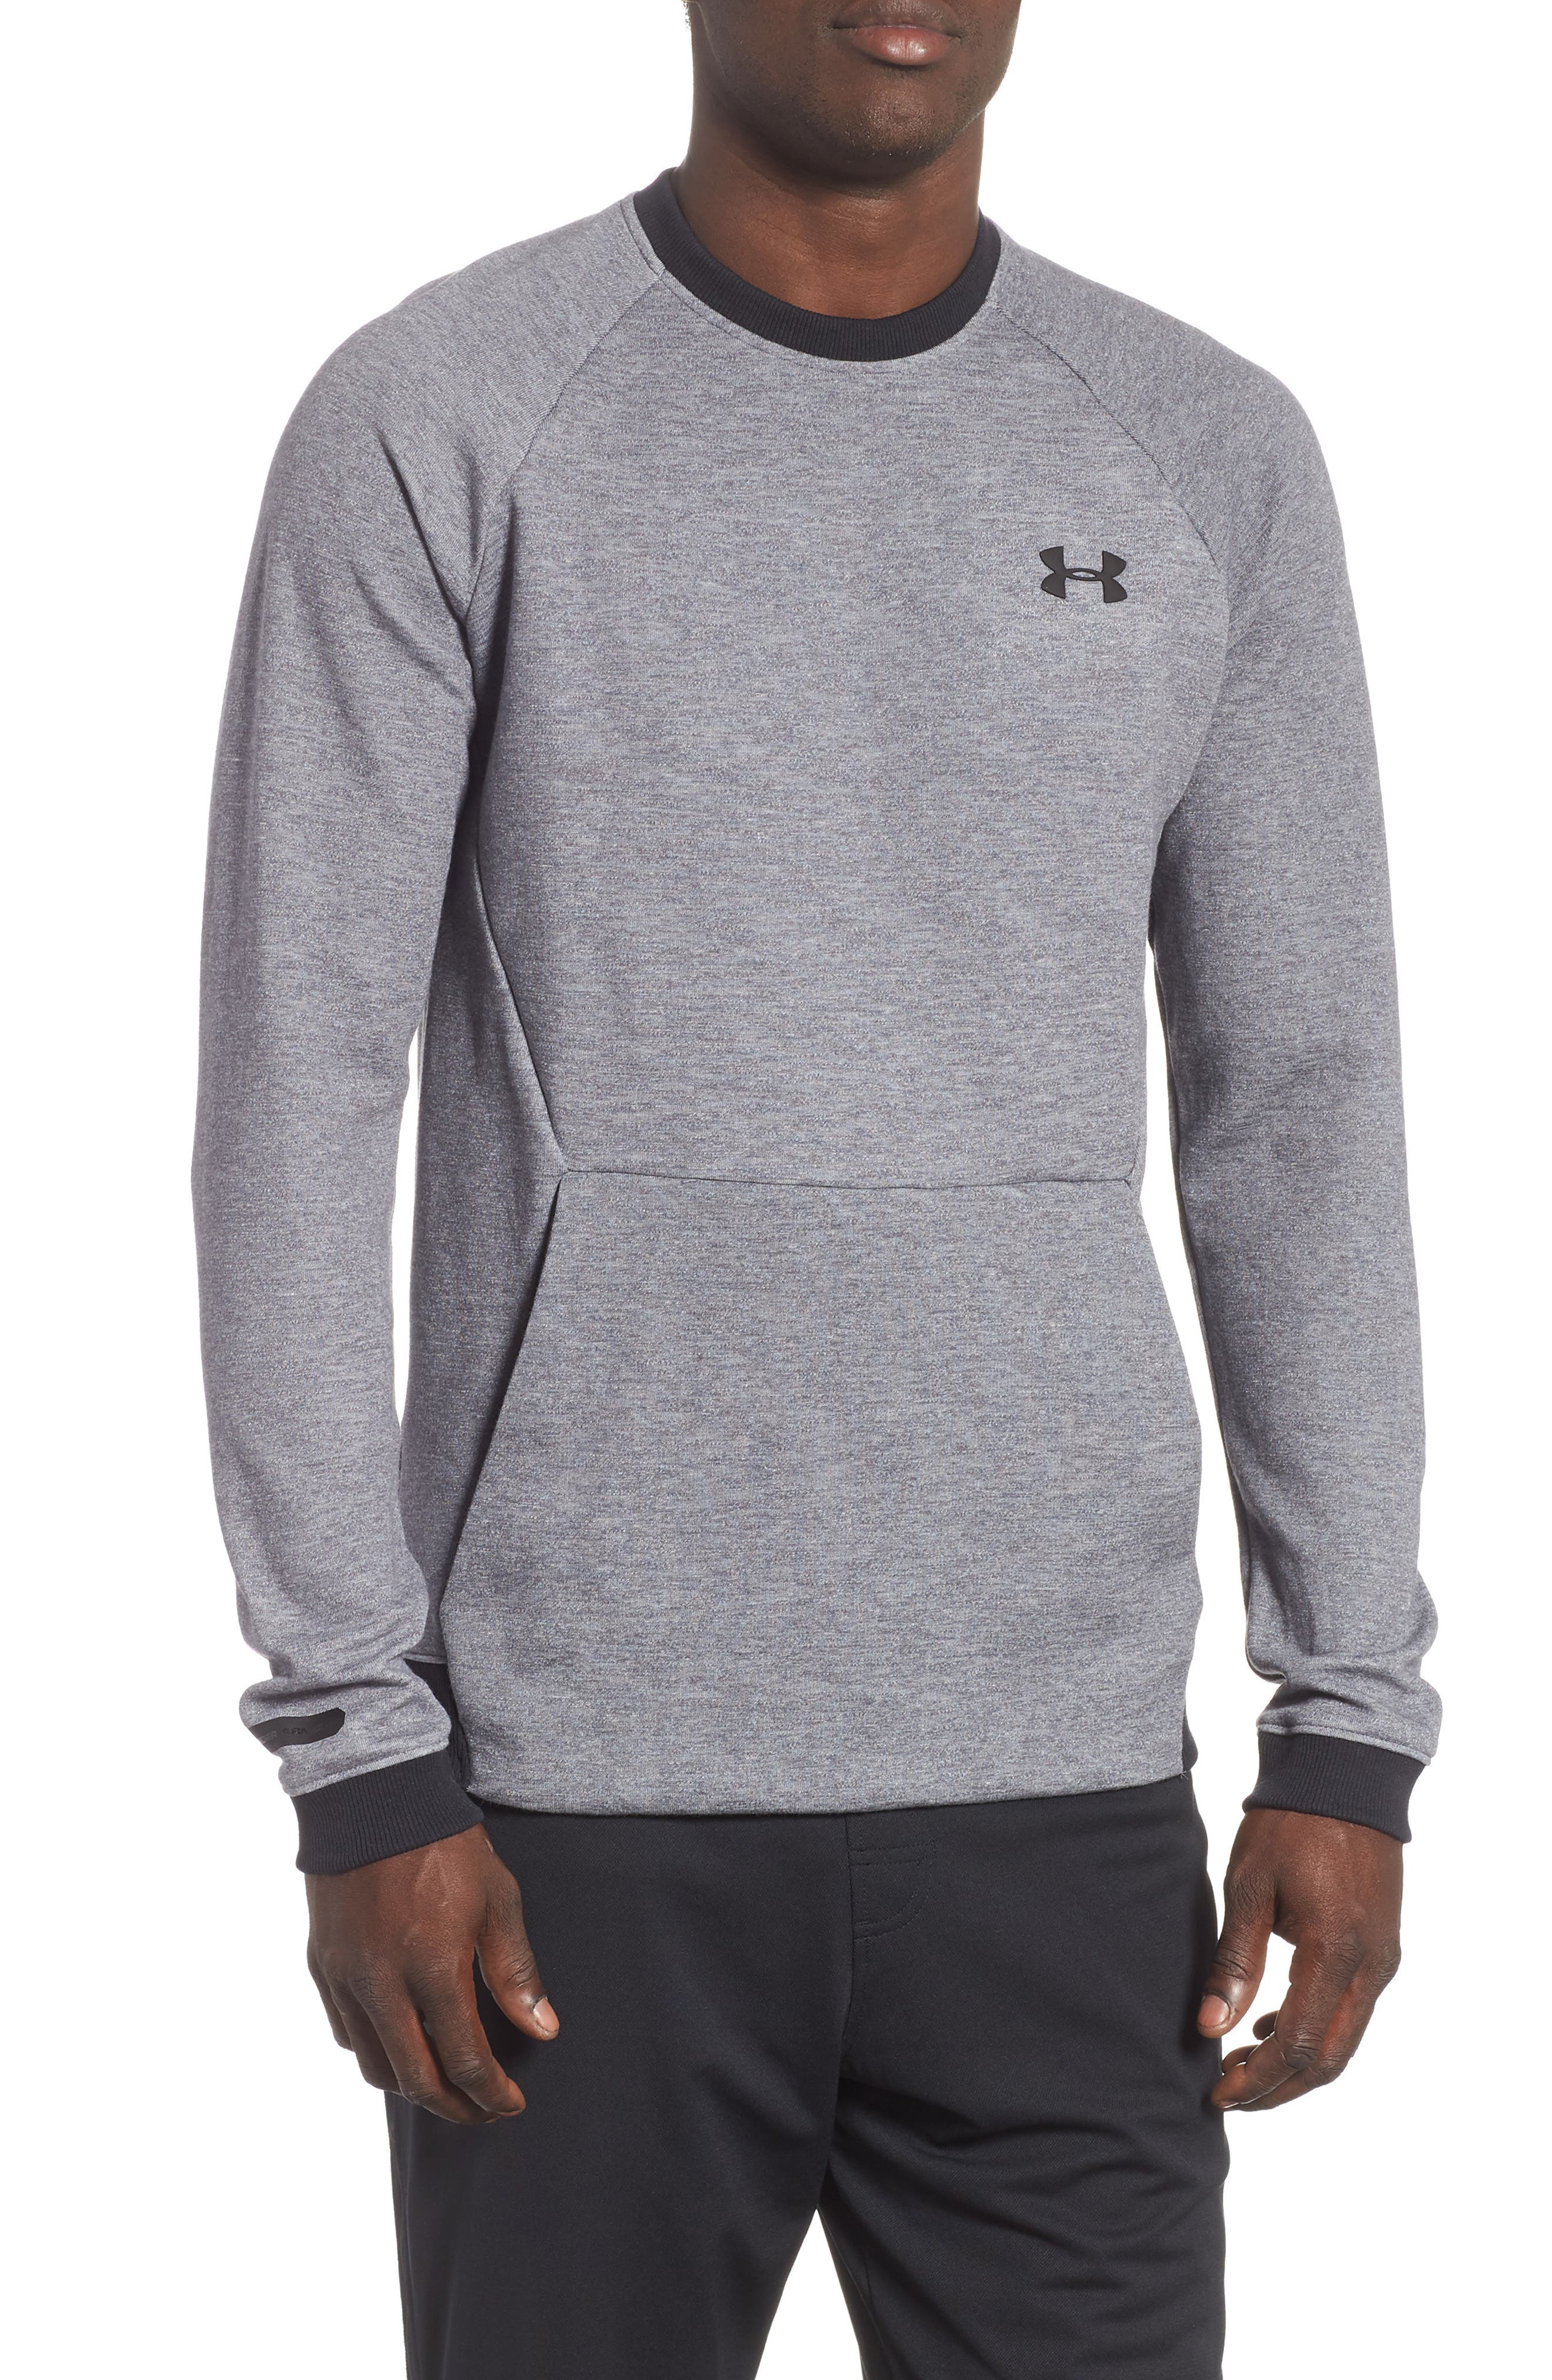 UNDER ARMOUR,                             Sportstyle 2x Crew Sweatshirt,                             Main thumbnail 1, color,                             STEEL